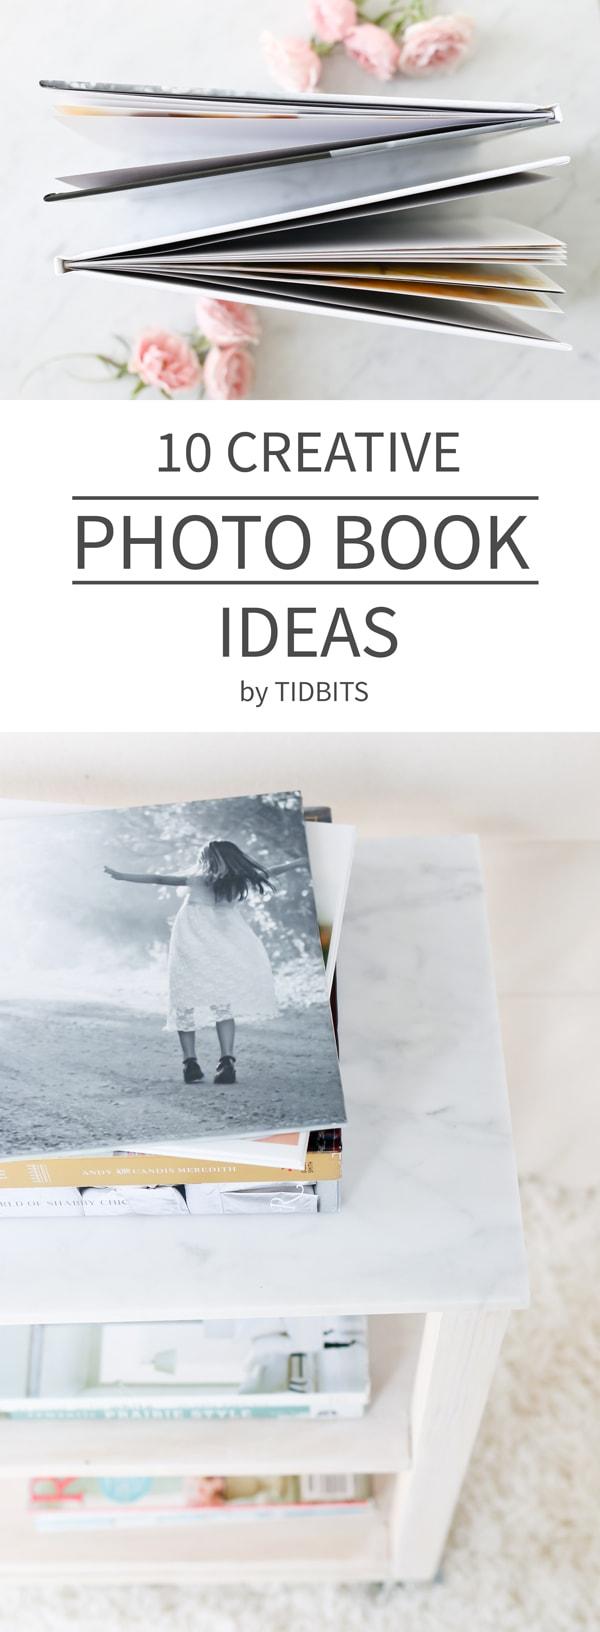 10 creative photo book ideas tidbits